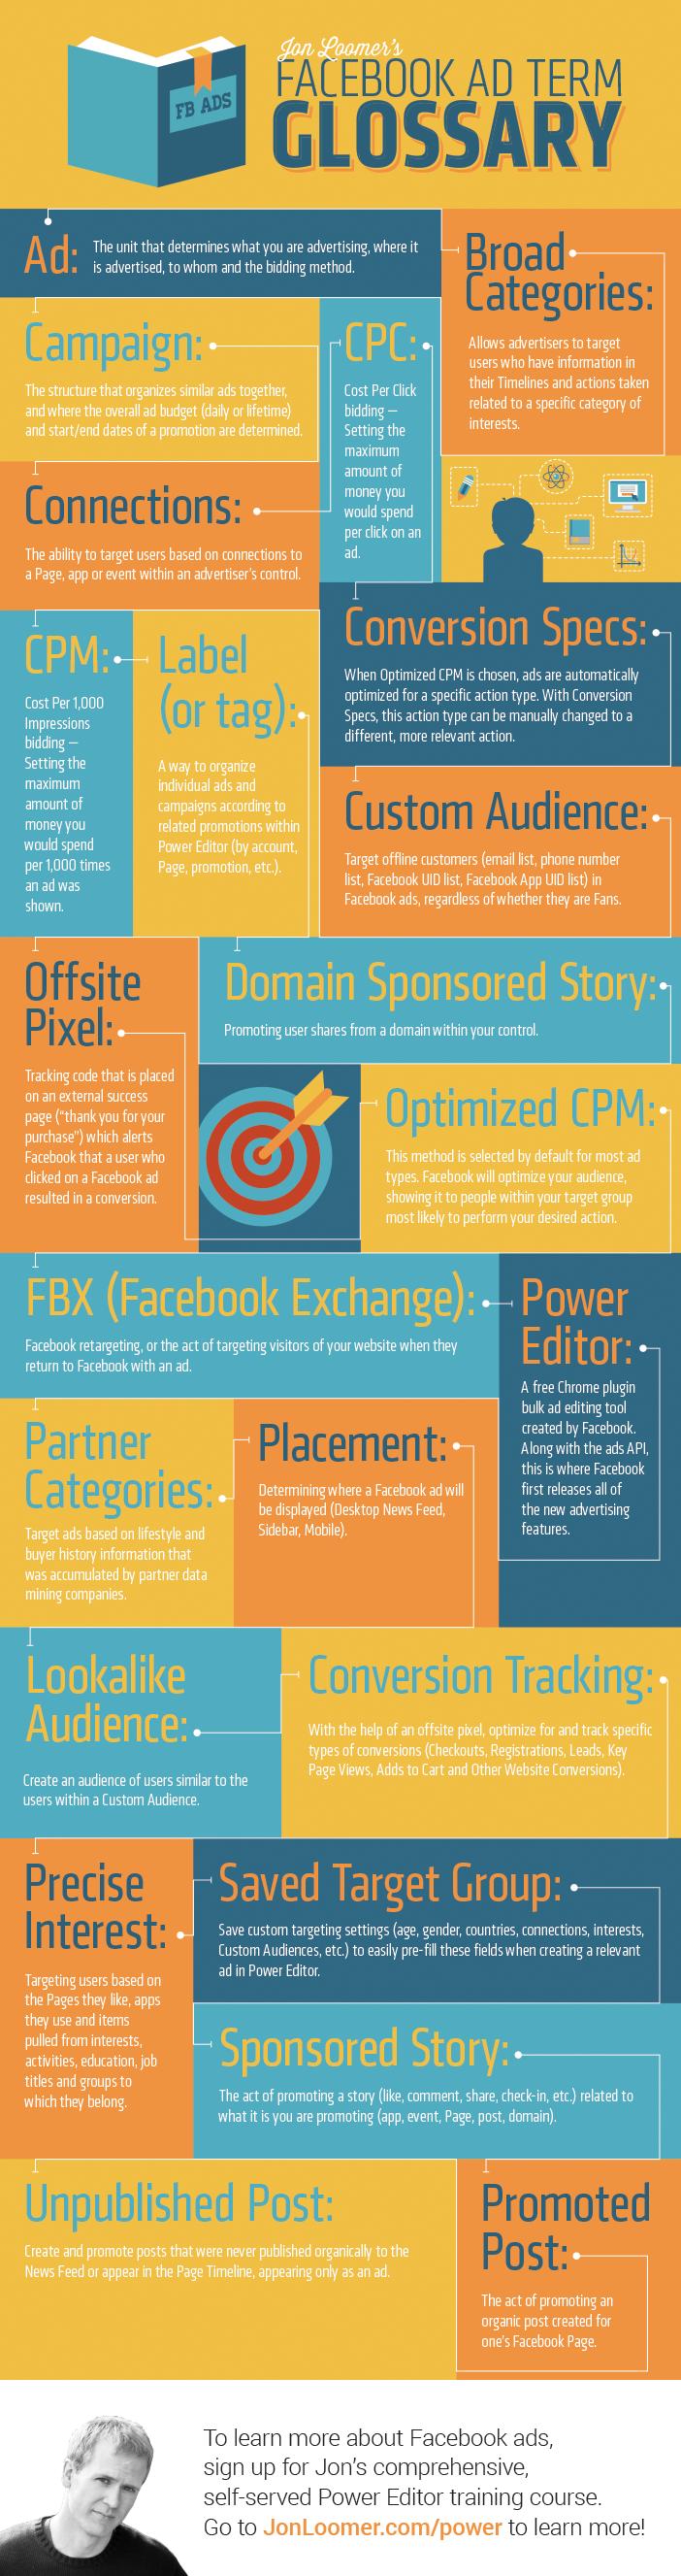 Facebook: Glosario de términos de Facebook Ads #infografia #socialmedia #marketing